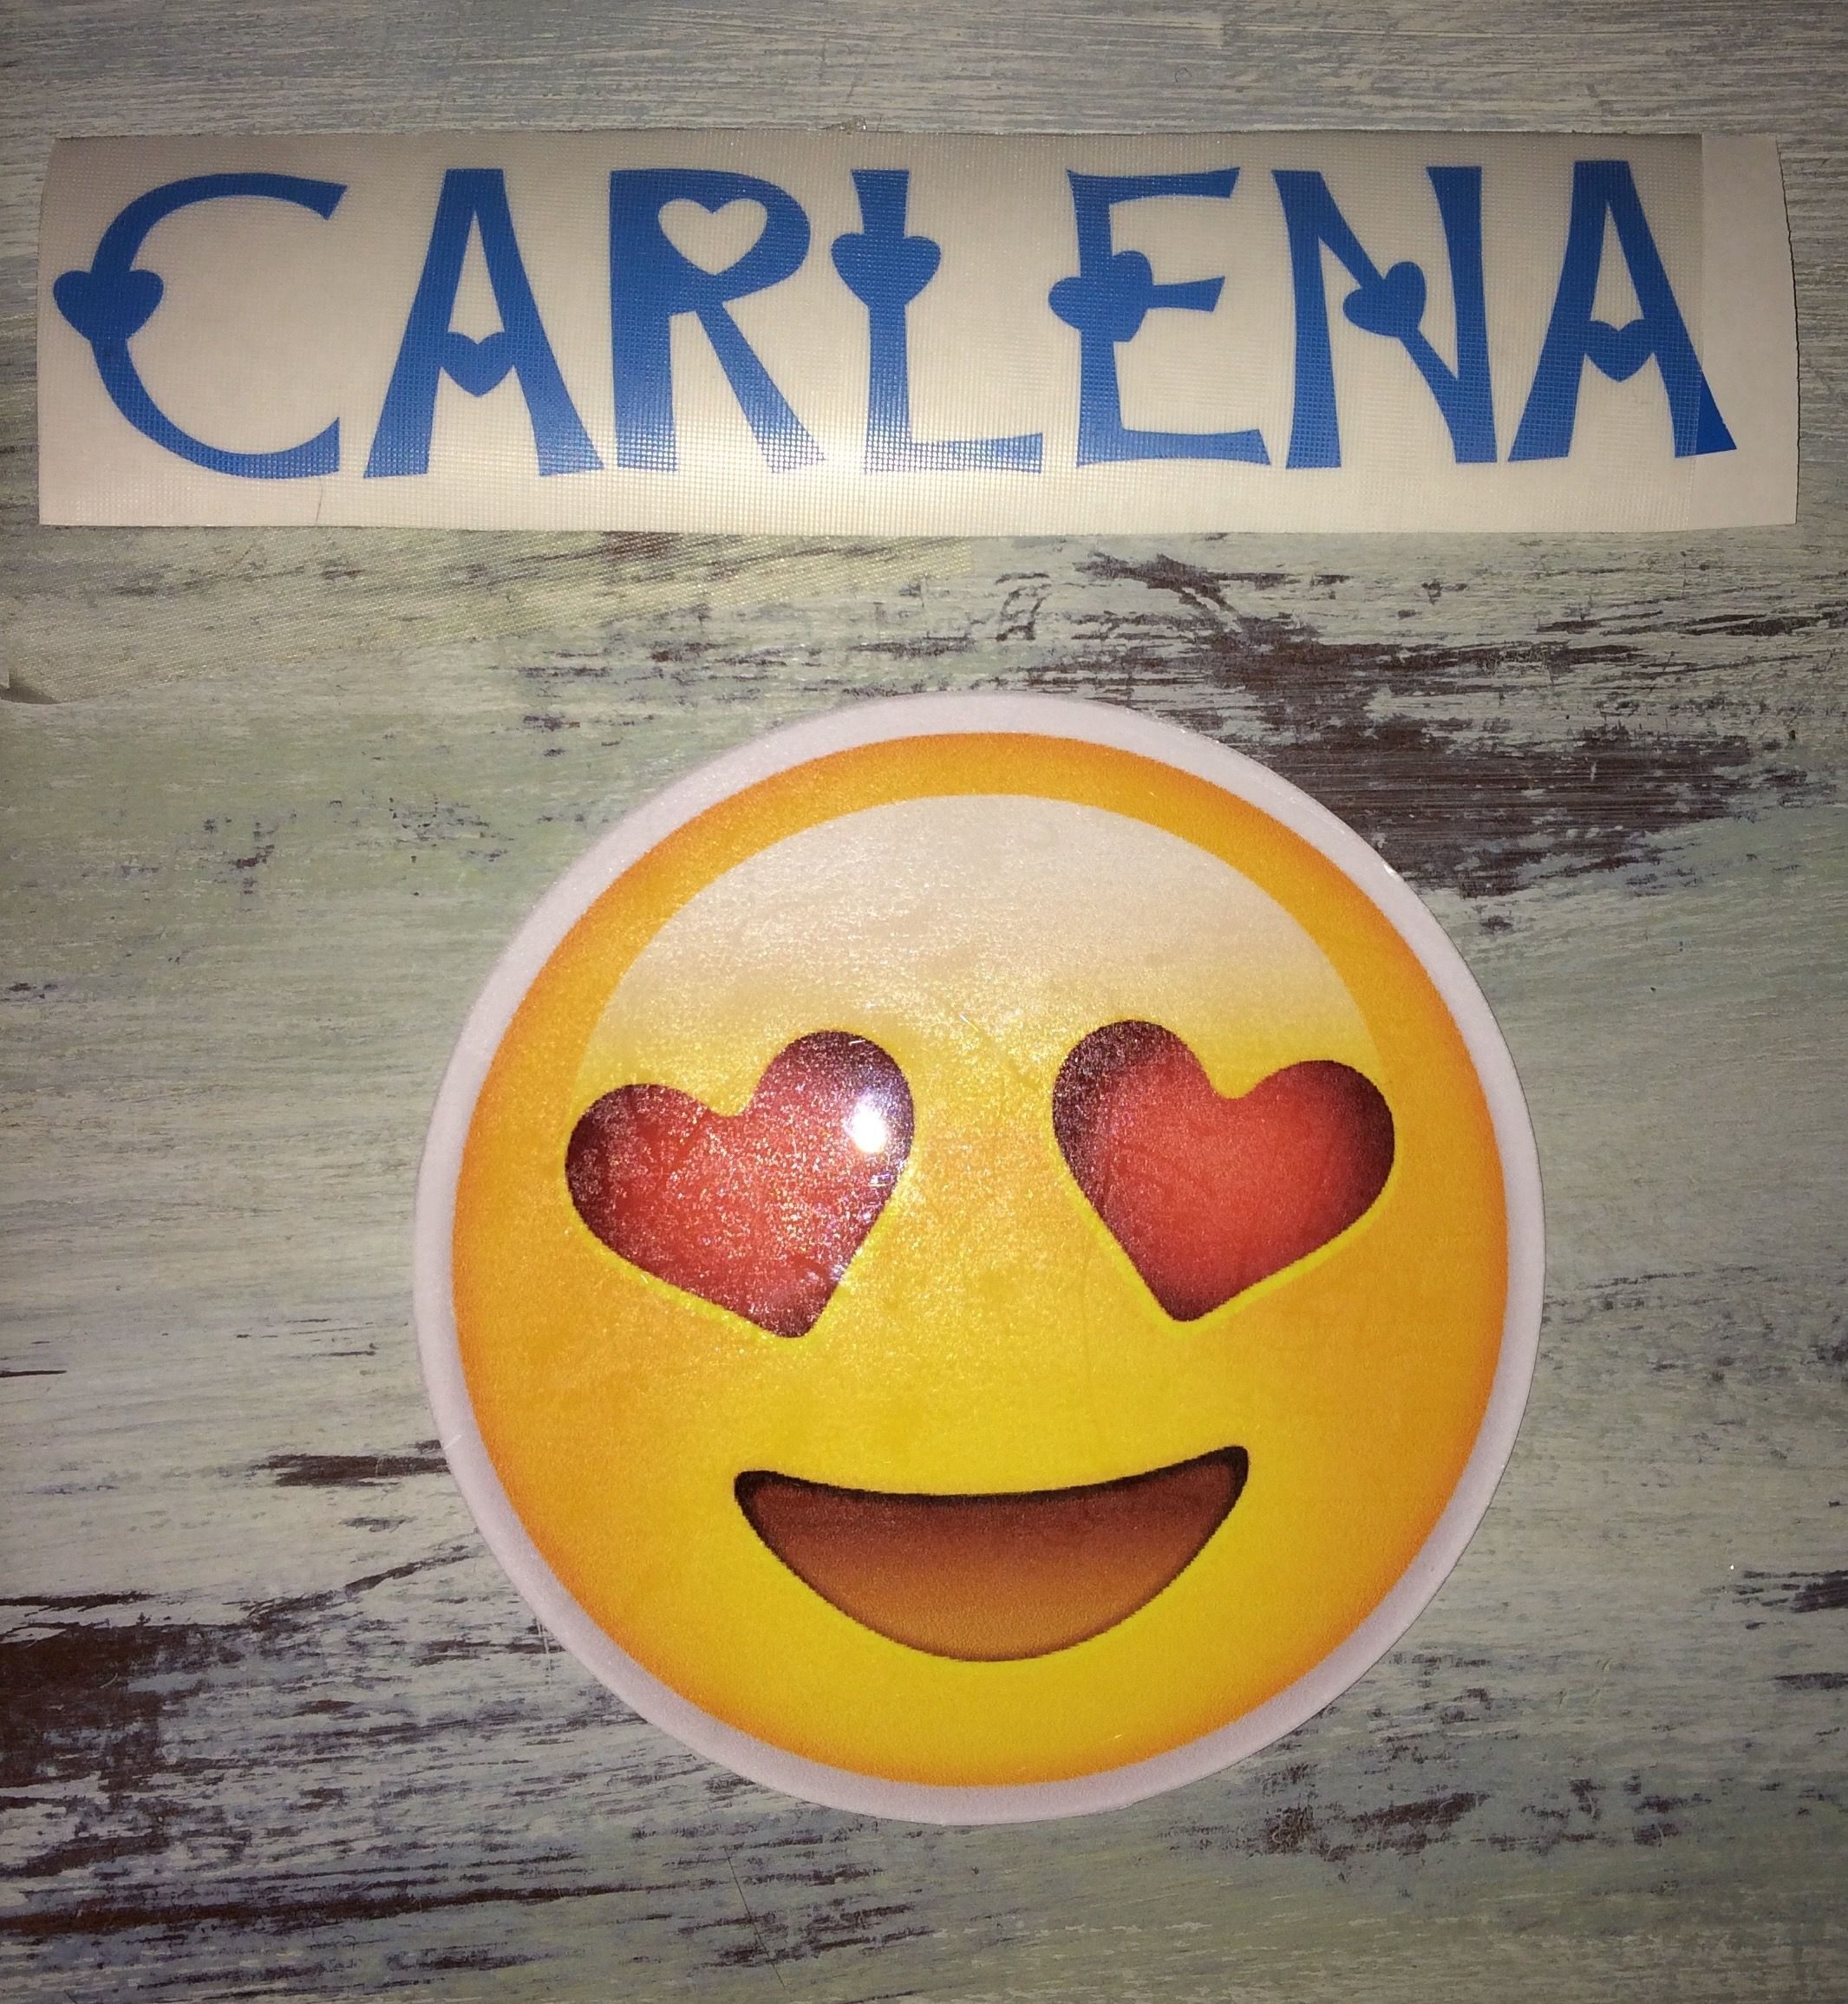 Custom Name And Emoji Decals Made With Cricut Explore Air Cricut Explore Air Emoji Cricut Explore